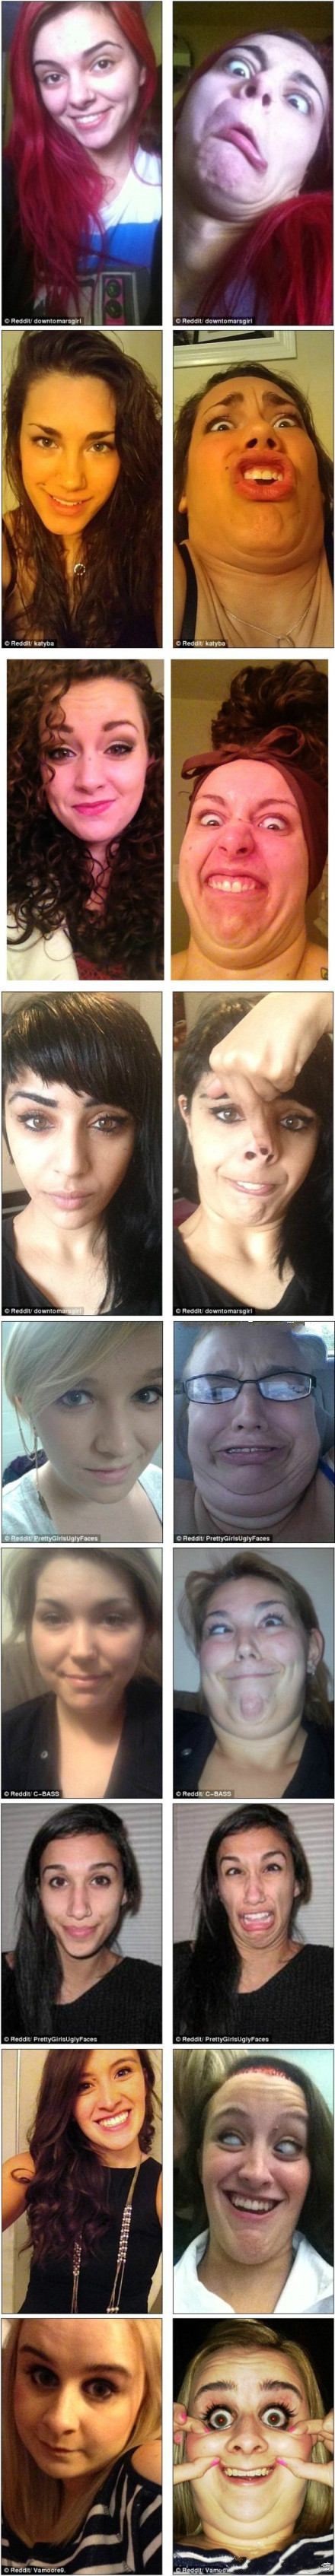 【Reddit上热门活动之一:漂亮姑娘做鬼脸】这是最近Reddit上的一个热门活动,就是妹纸们自己发一张自己正常的照片,然后发一张鬼脸照片,以最惨不忍睹最佳。于是,美帝的姑娘们拼了。。。